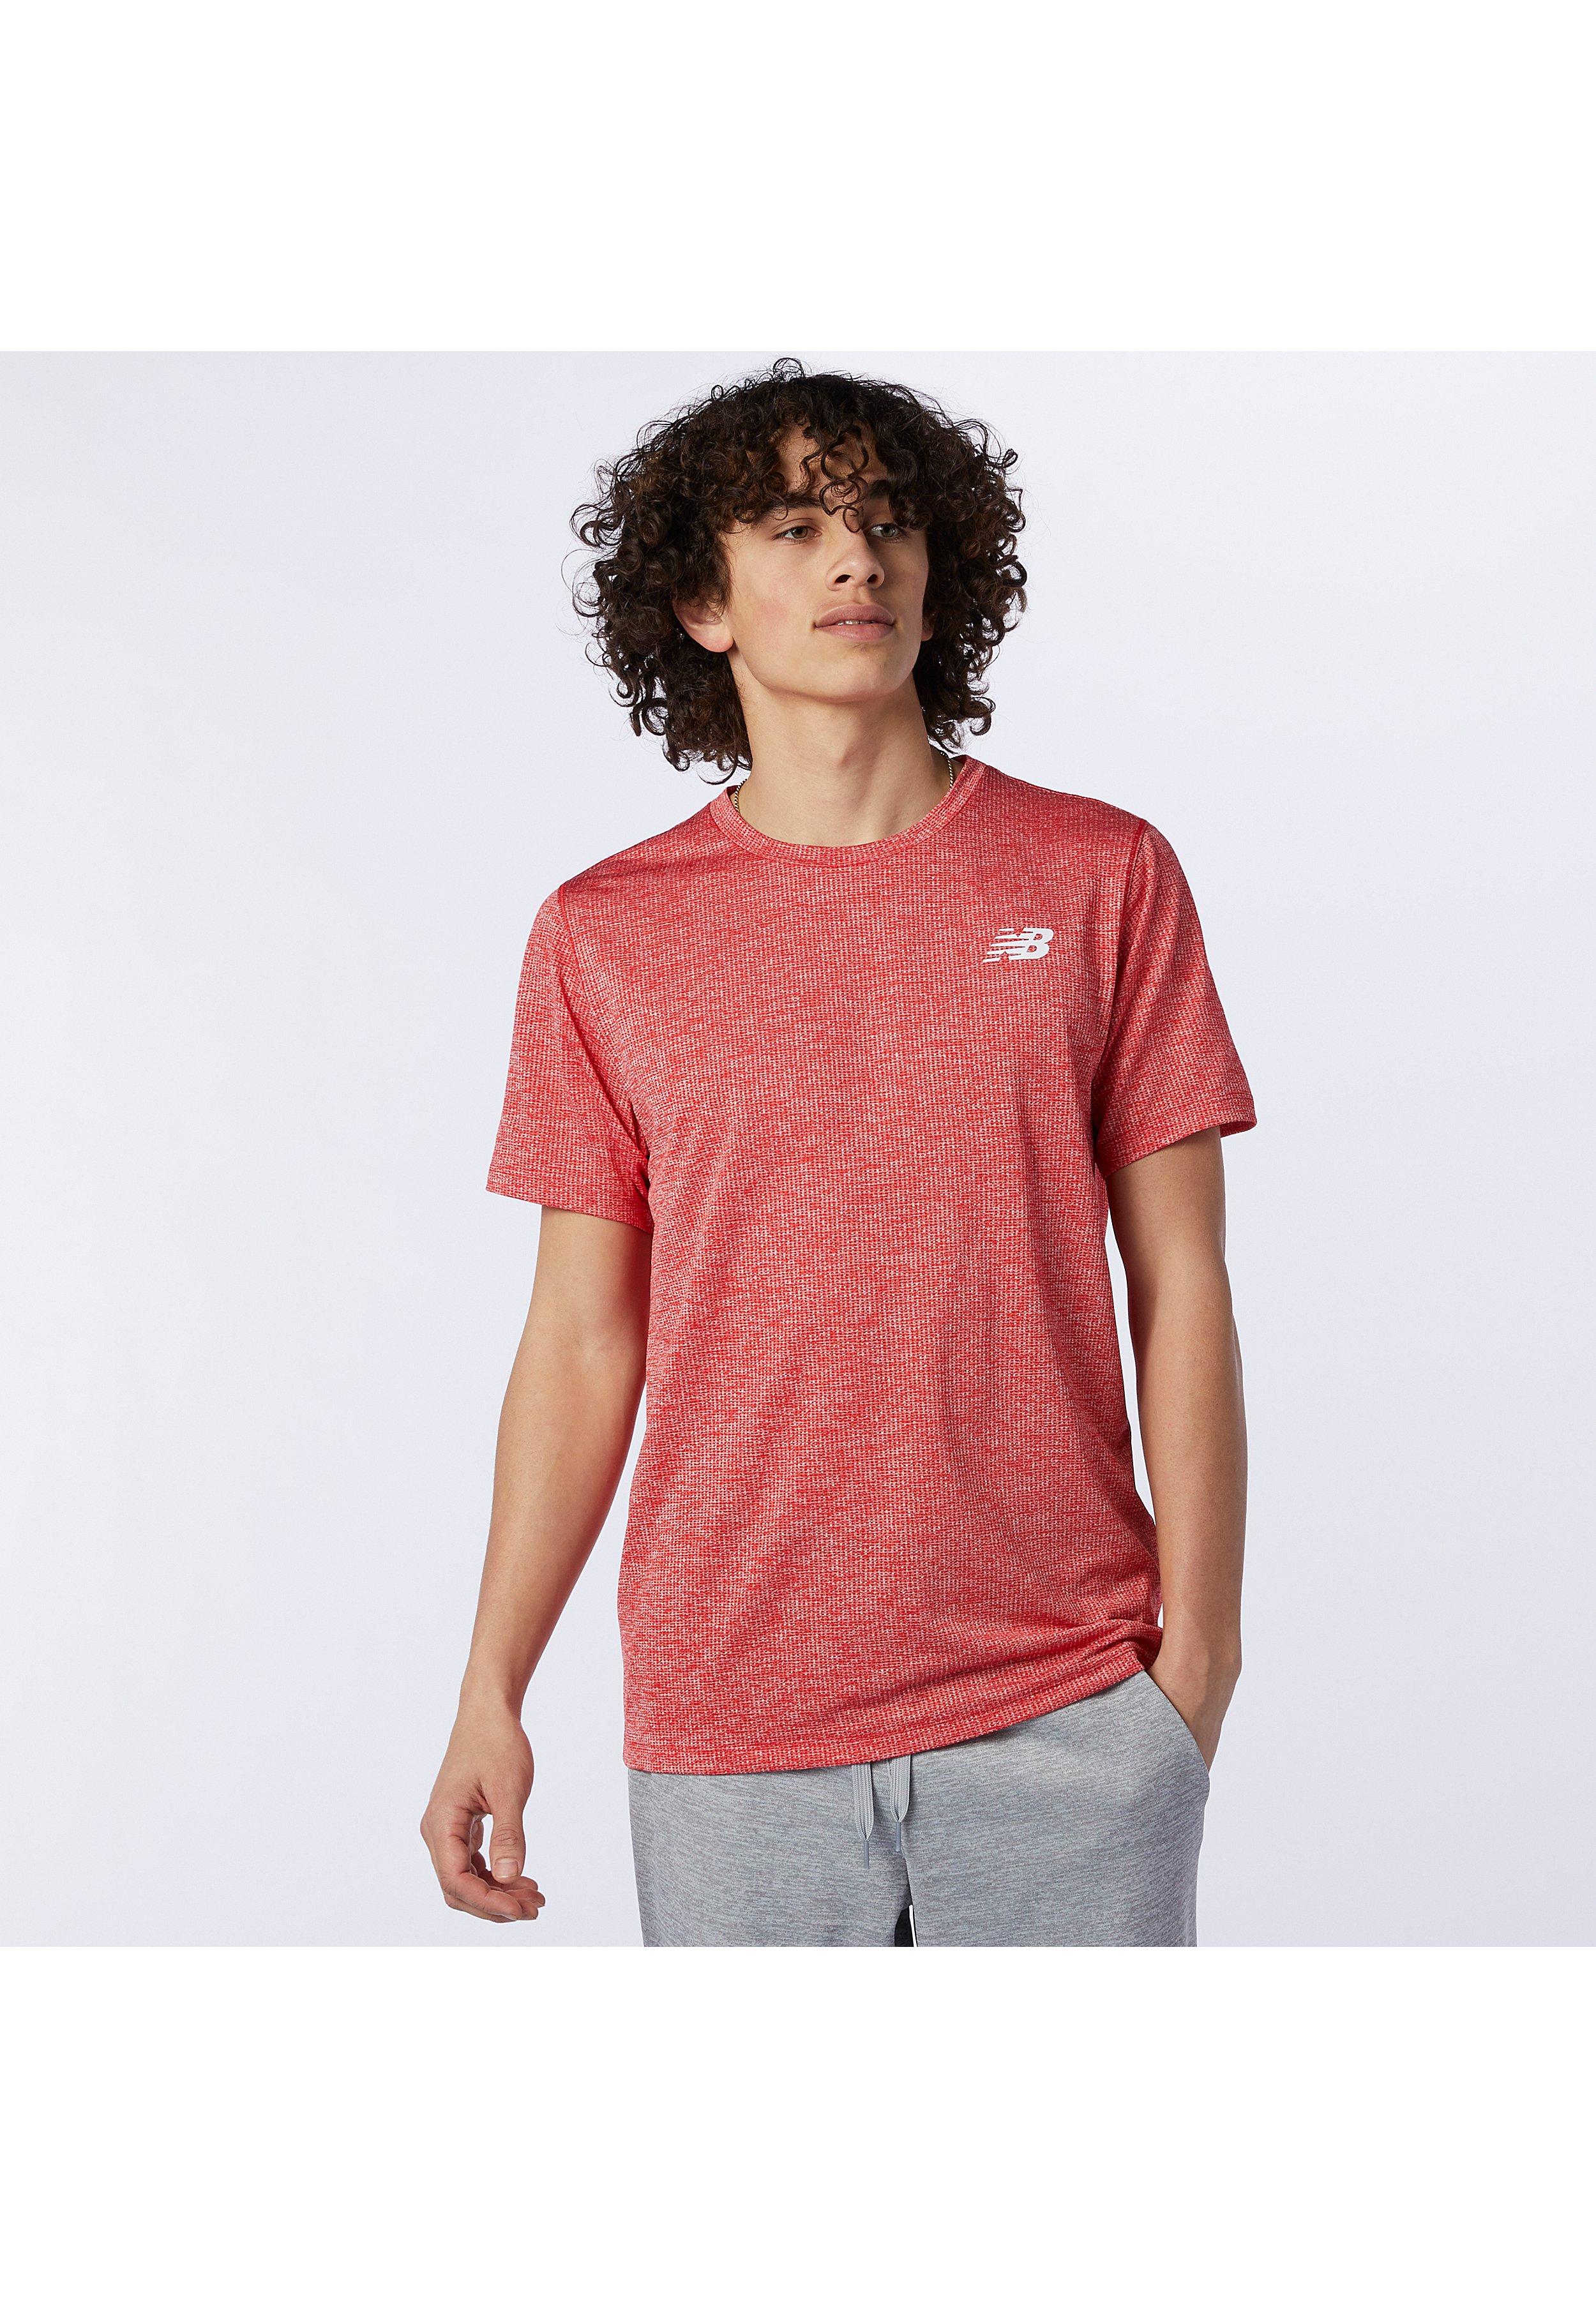 Hombre TENACITY - Camiseta básica - team red inline